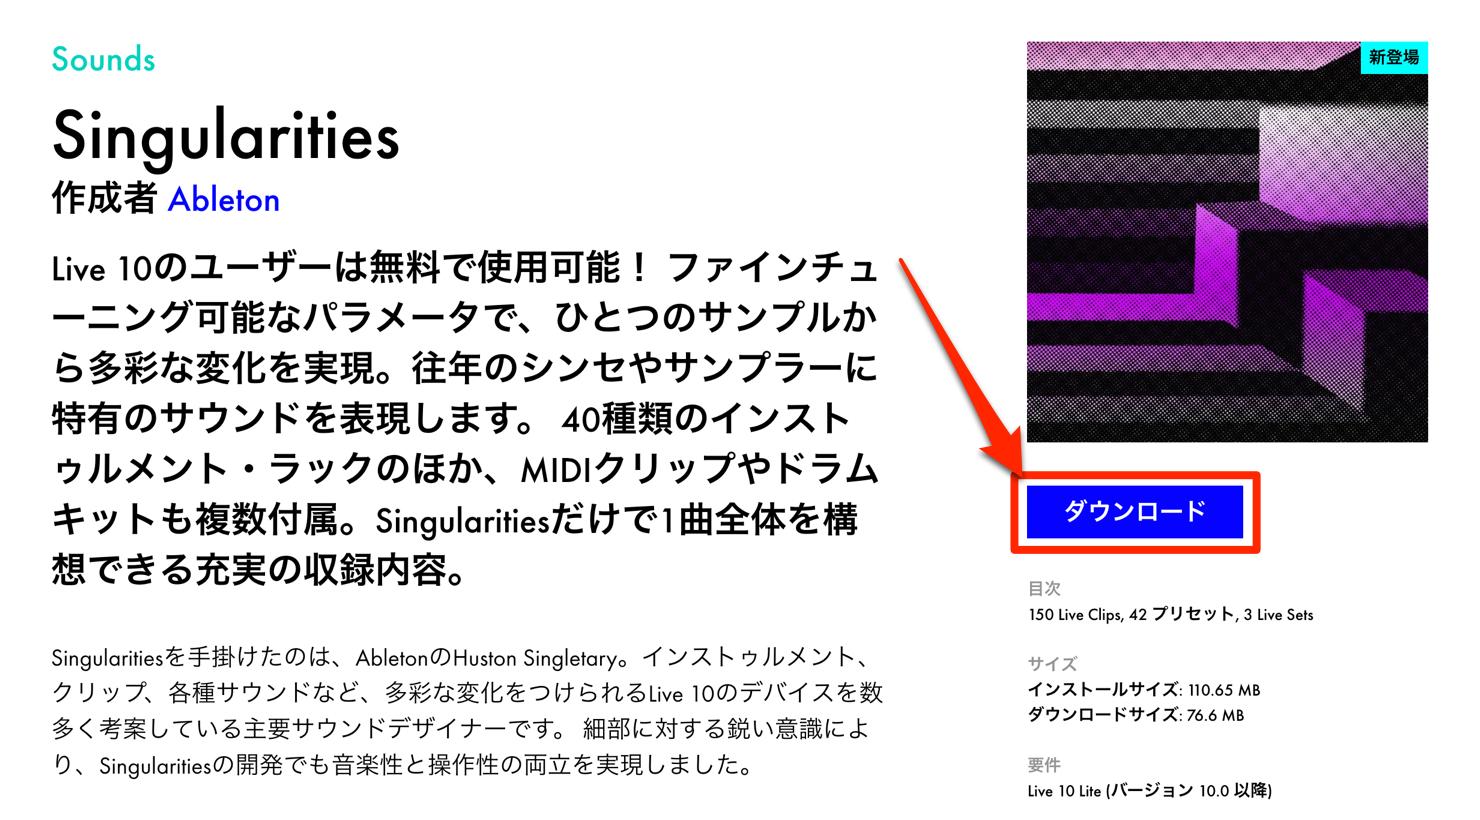 Singularities-free-pack-live10-ableton-0